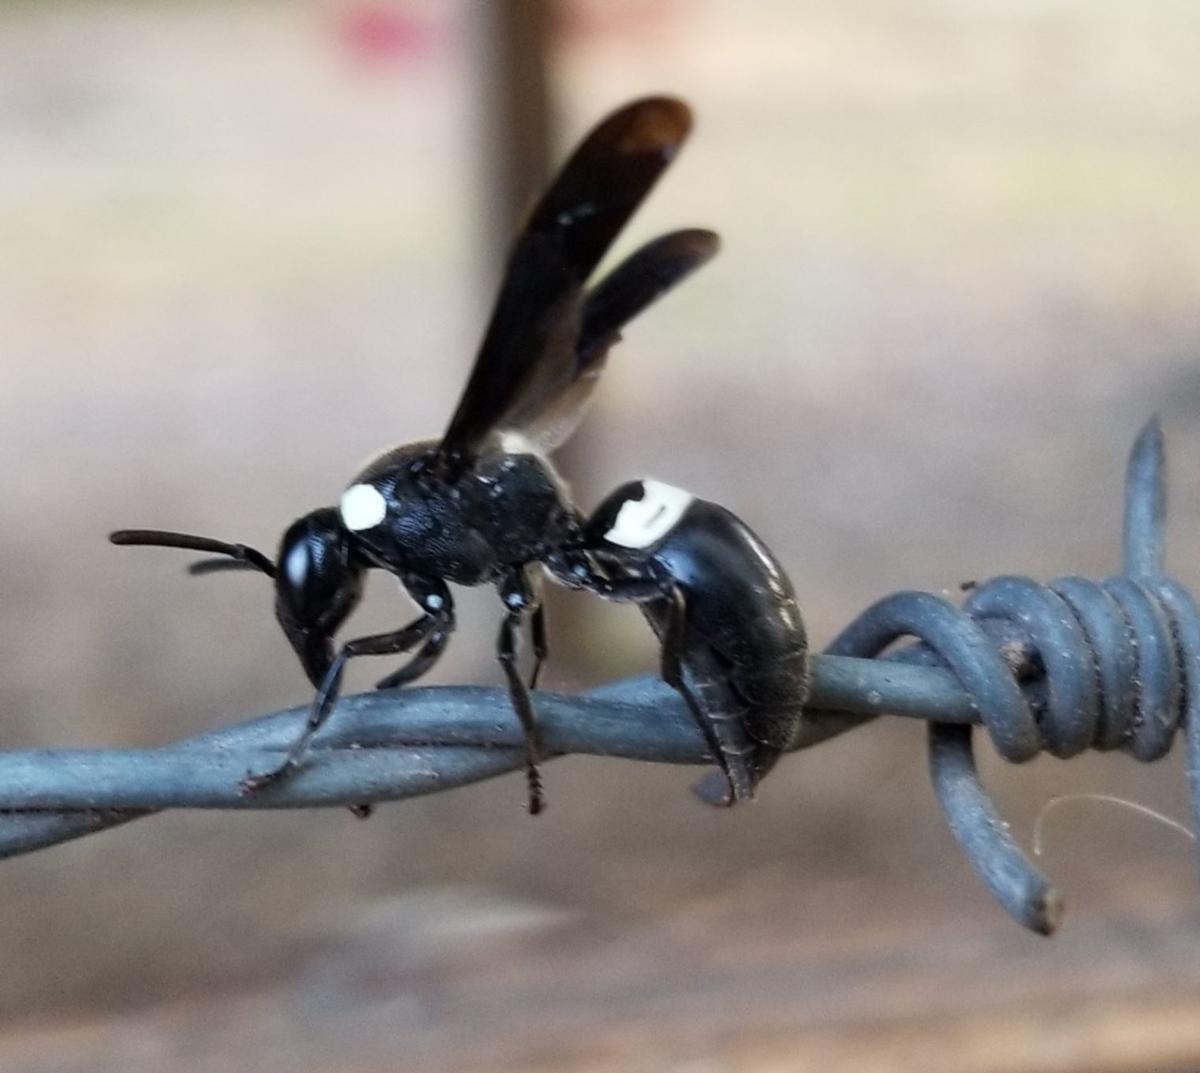 wasp solitary chronicleonline bidens trouble mason looking any leslie